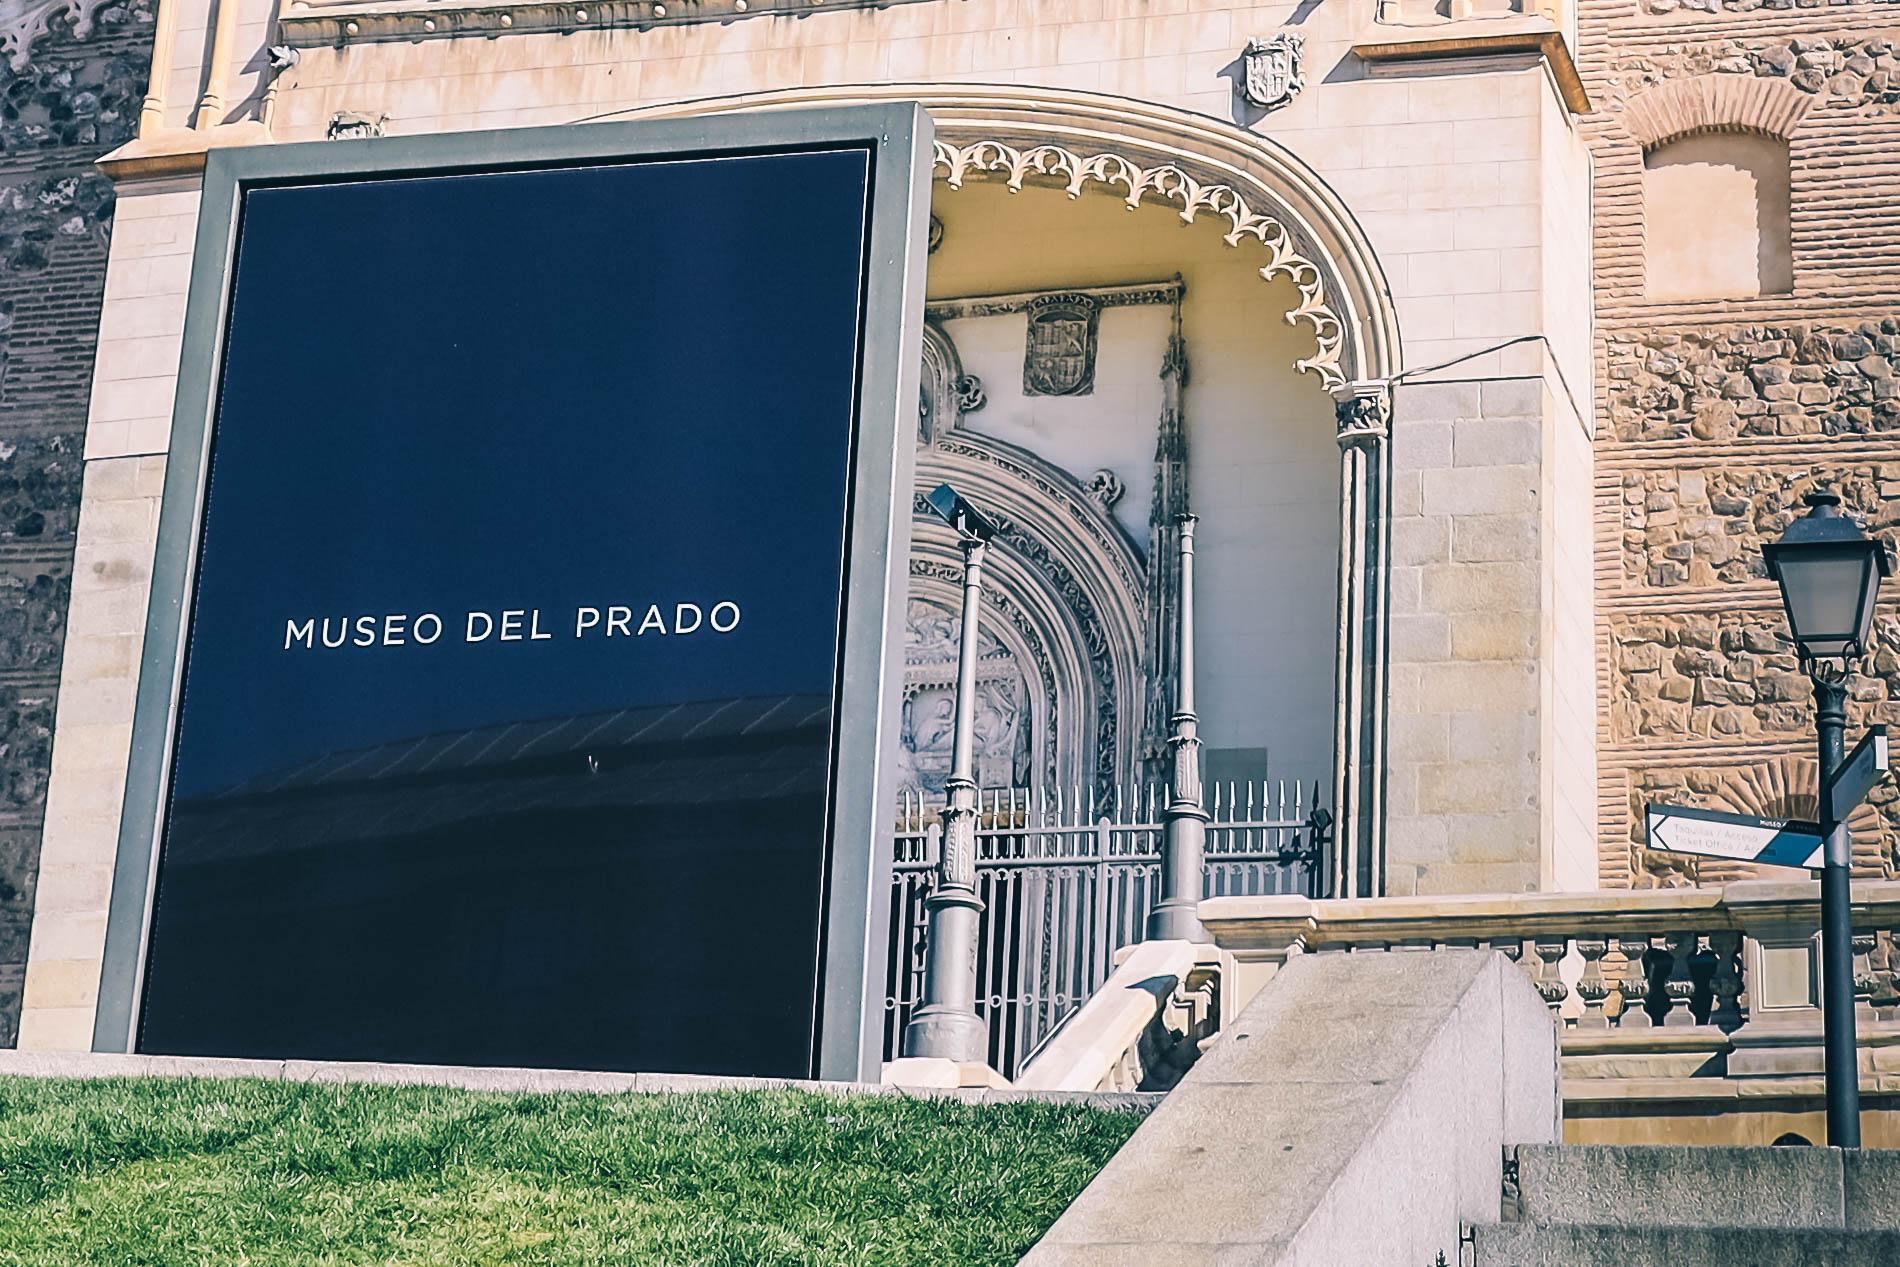 Panneau Musée du Prado de Madrid